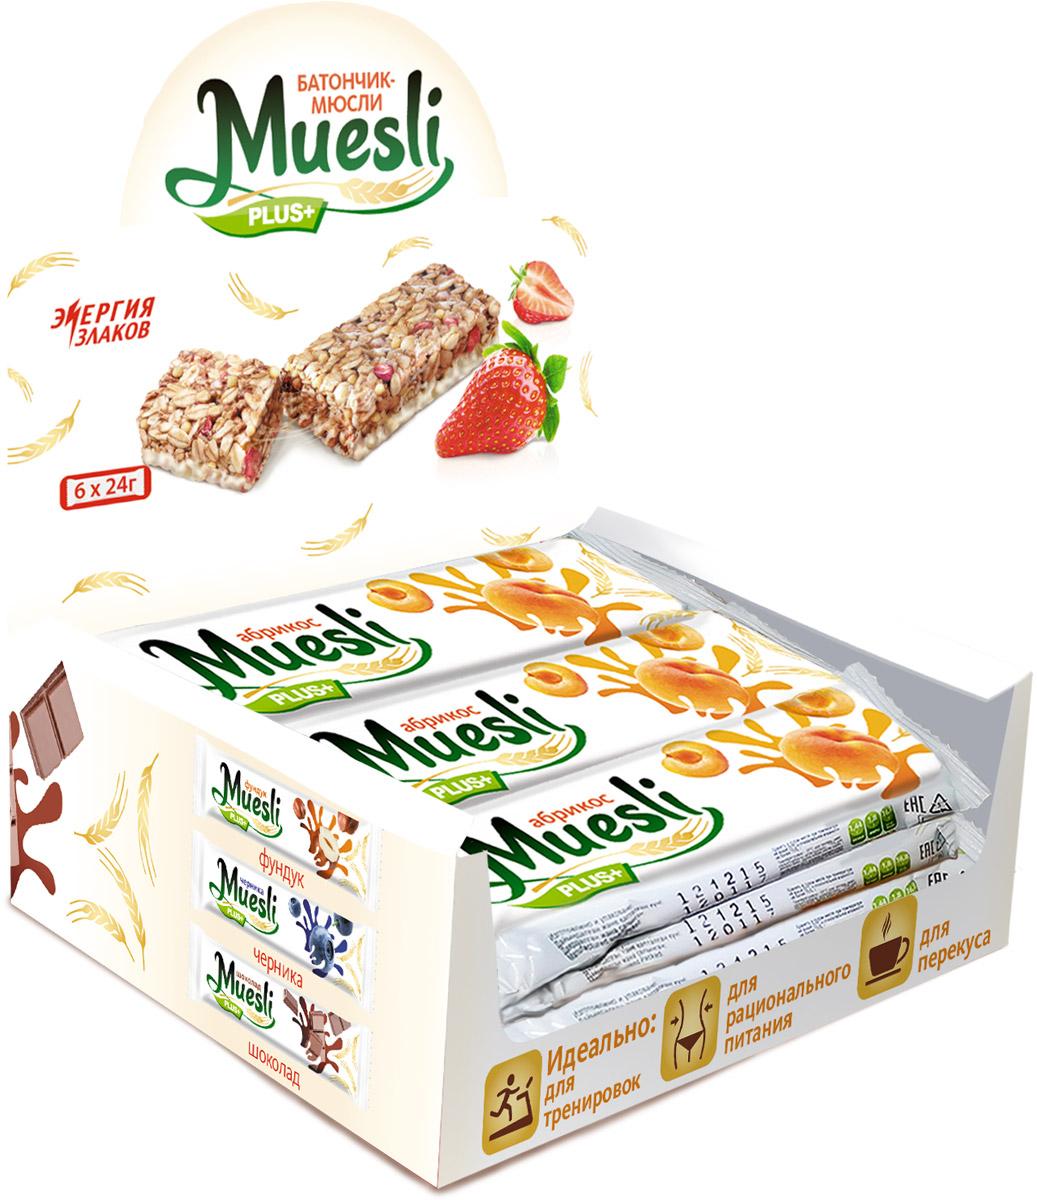 Matti Muesli Plus батончик мюсли абрикос, 6 шт по 24 г energon muesli slim клюква и злаки батончик злаковый 40 г